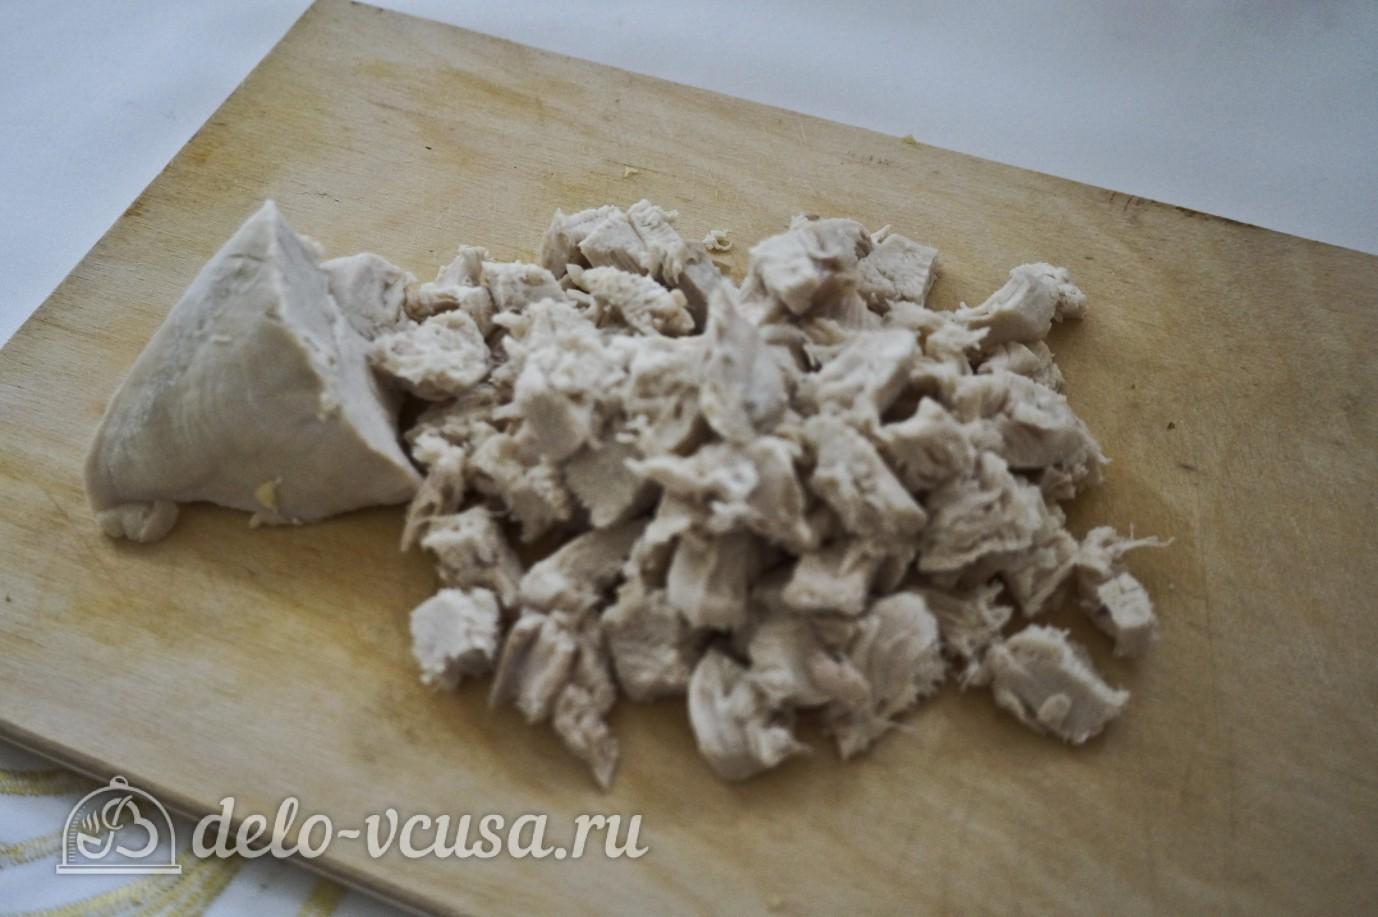 Пироги с палтусом из дрожжевого теста рецепт пошагово